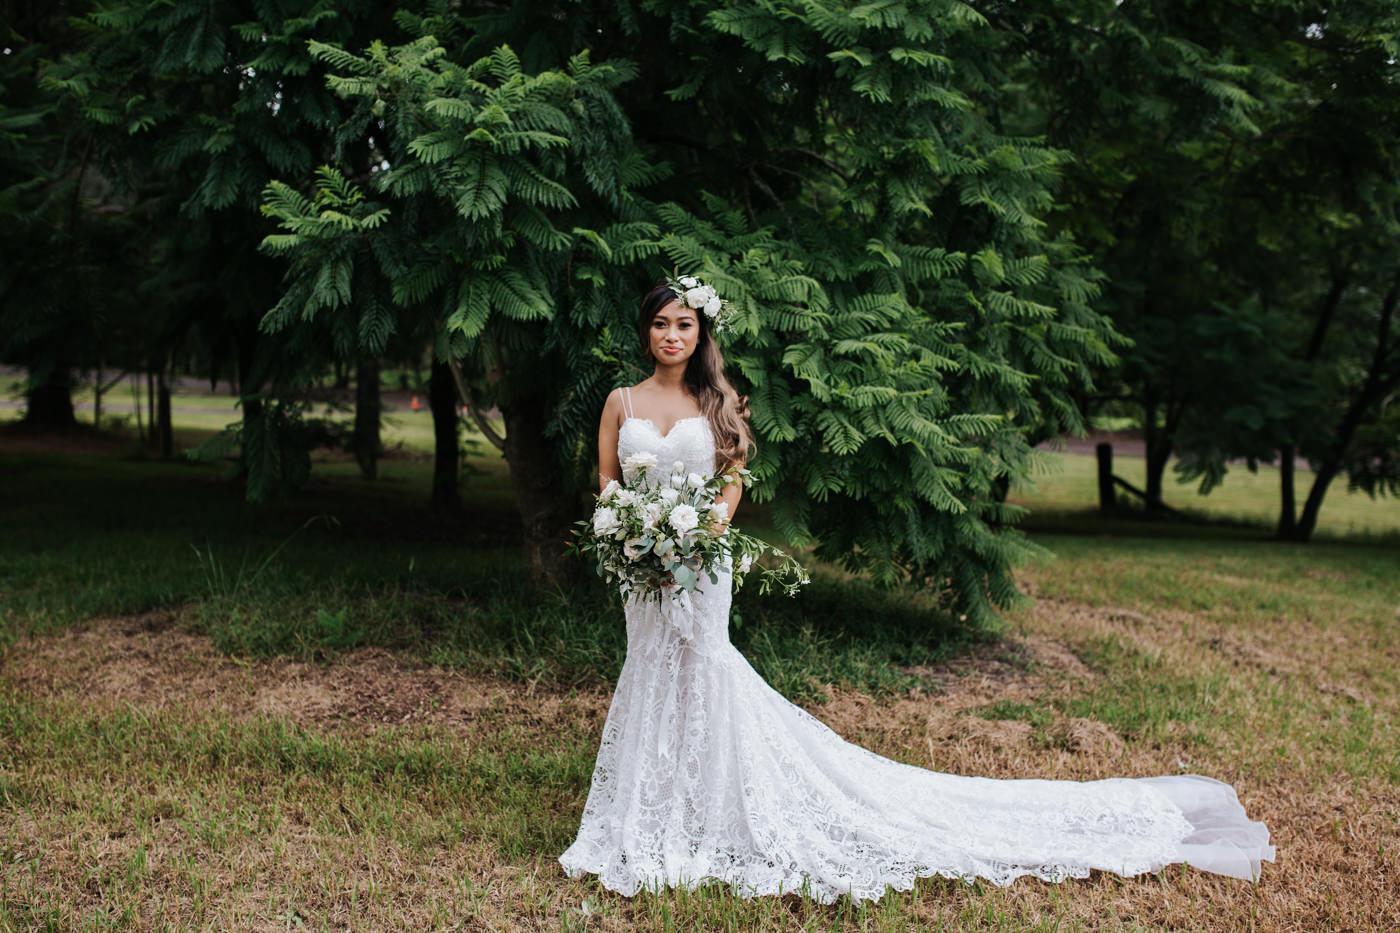 Nick & Vanezza - Fernbank Farm Wedding - Samantha Heather Photography-94.jpg